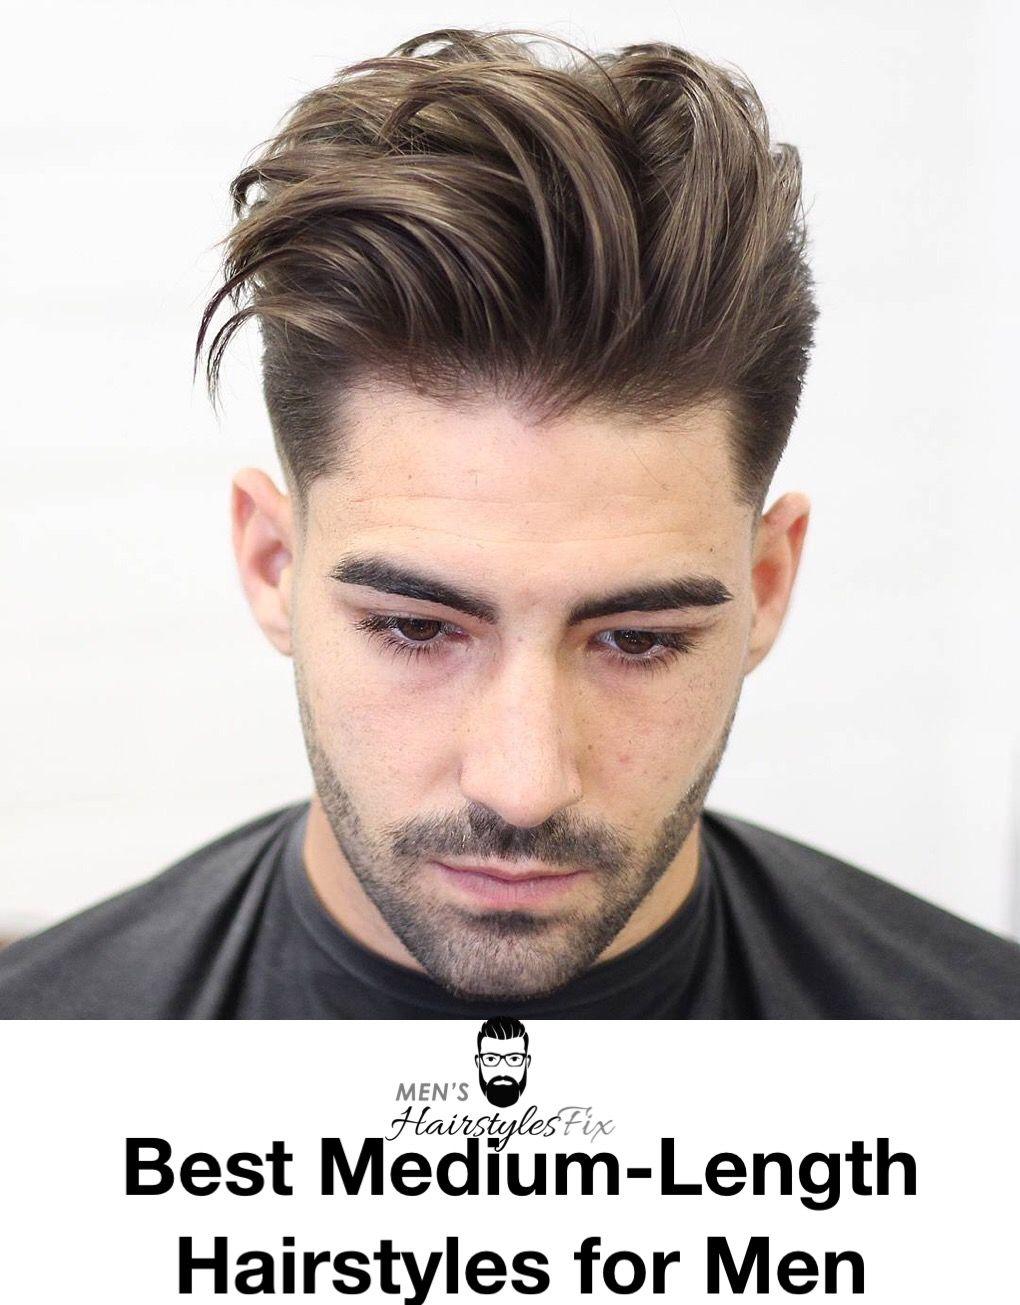 20 best medium-length hairstyles for men in 2018 | medium